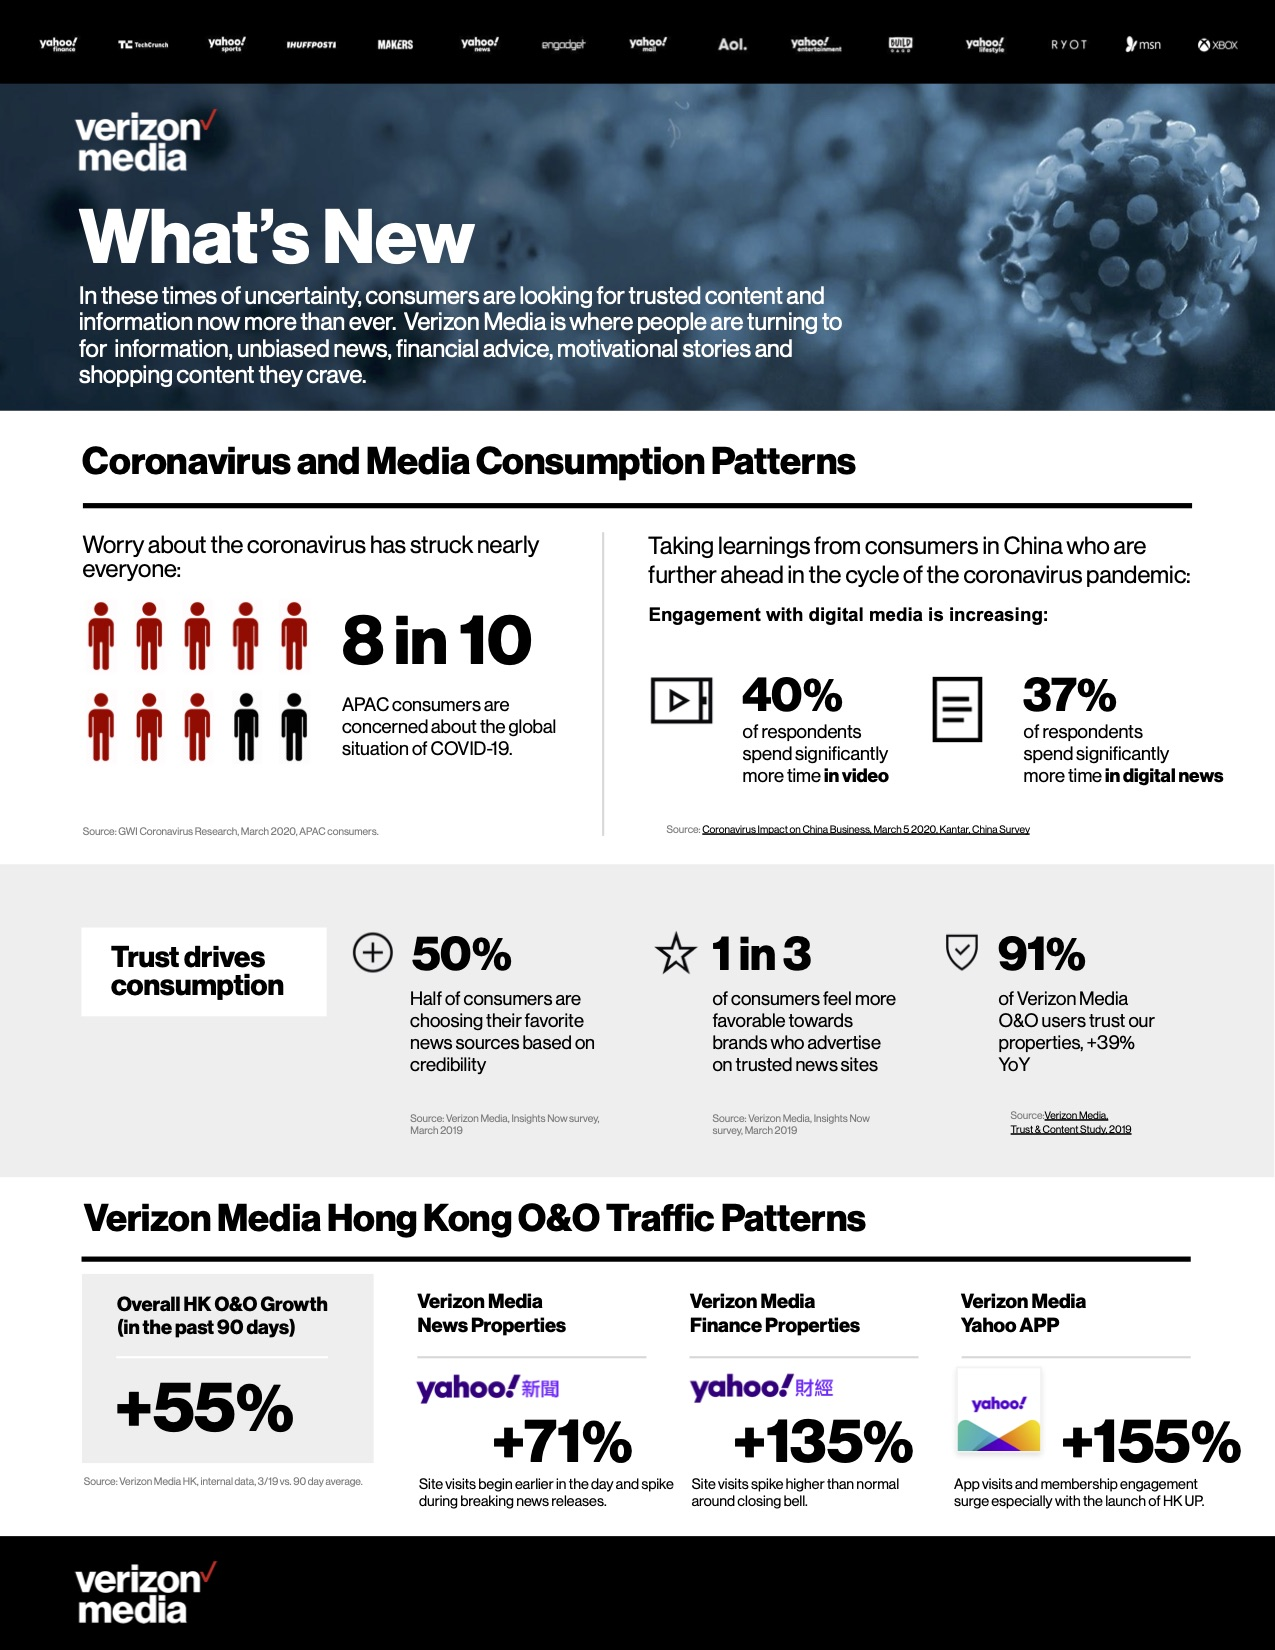 Coronavirus and YHK Media Consumption Patterns 1